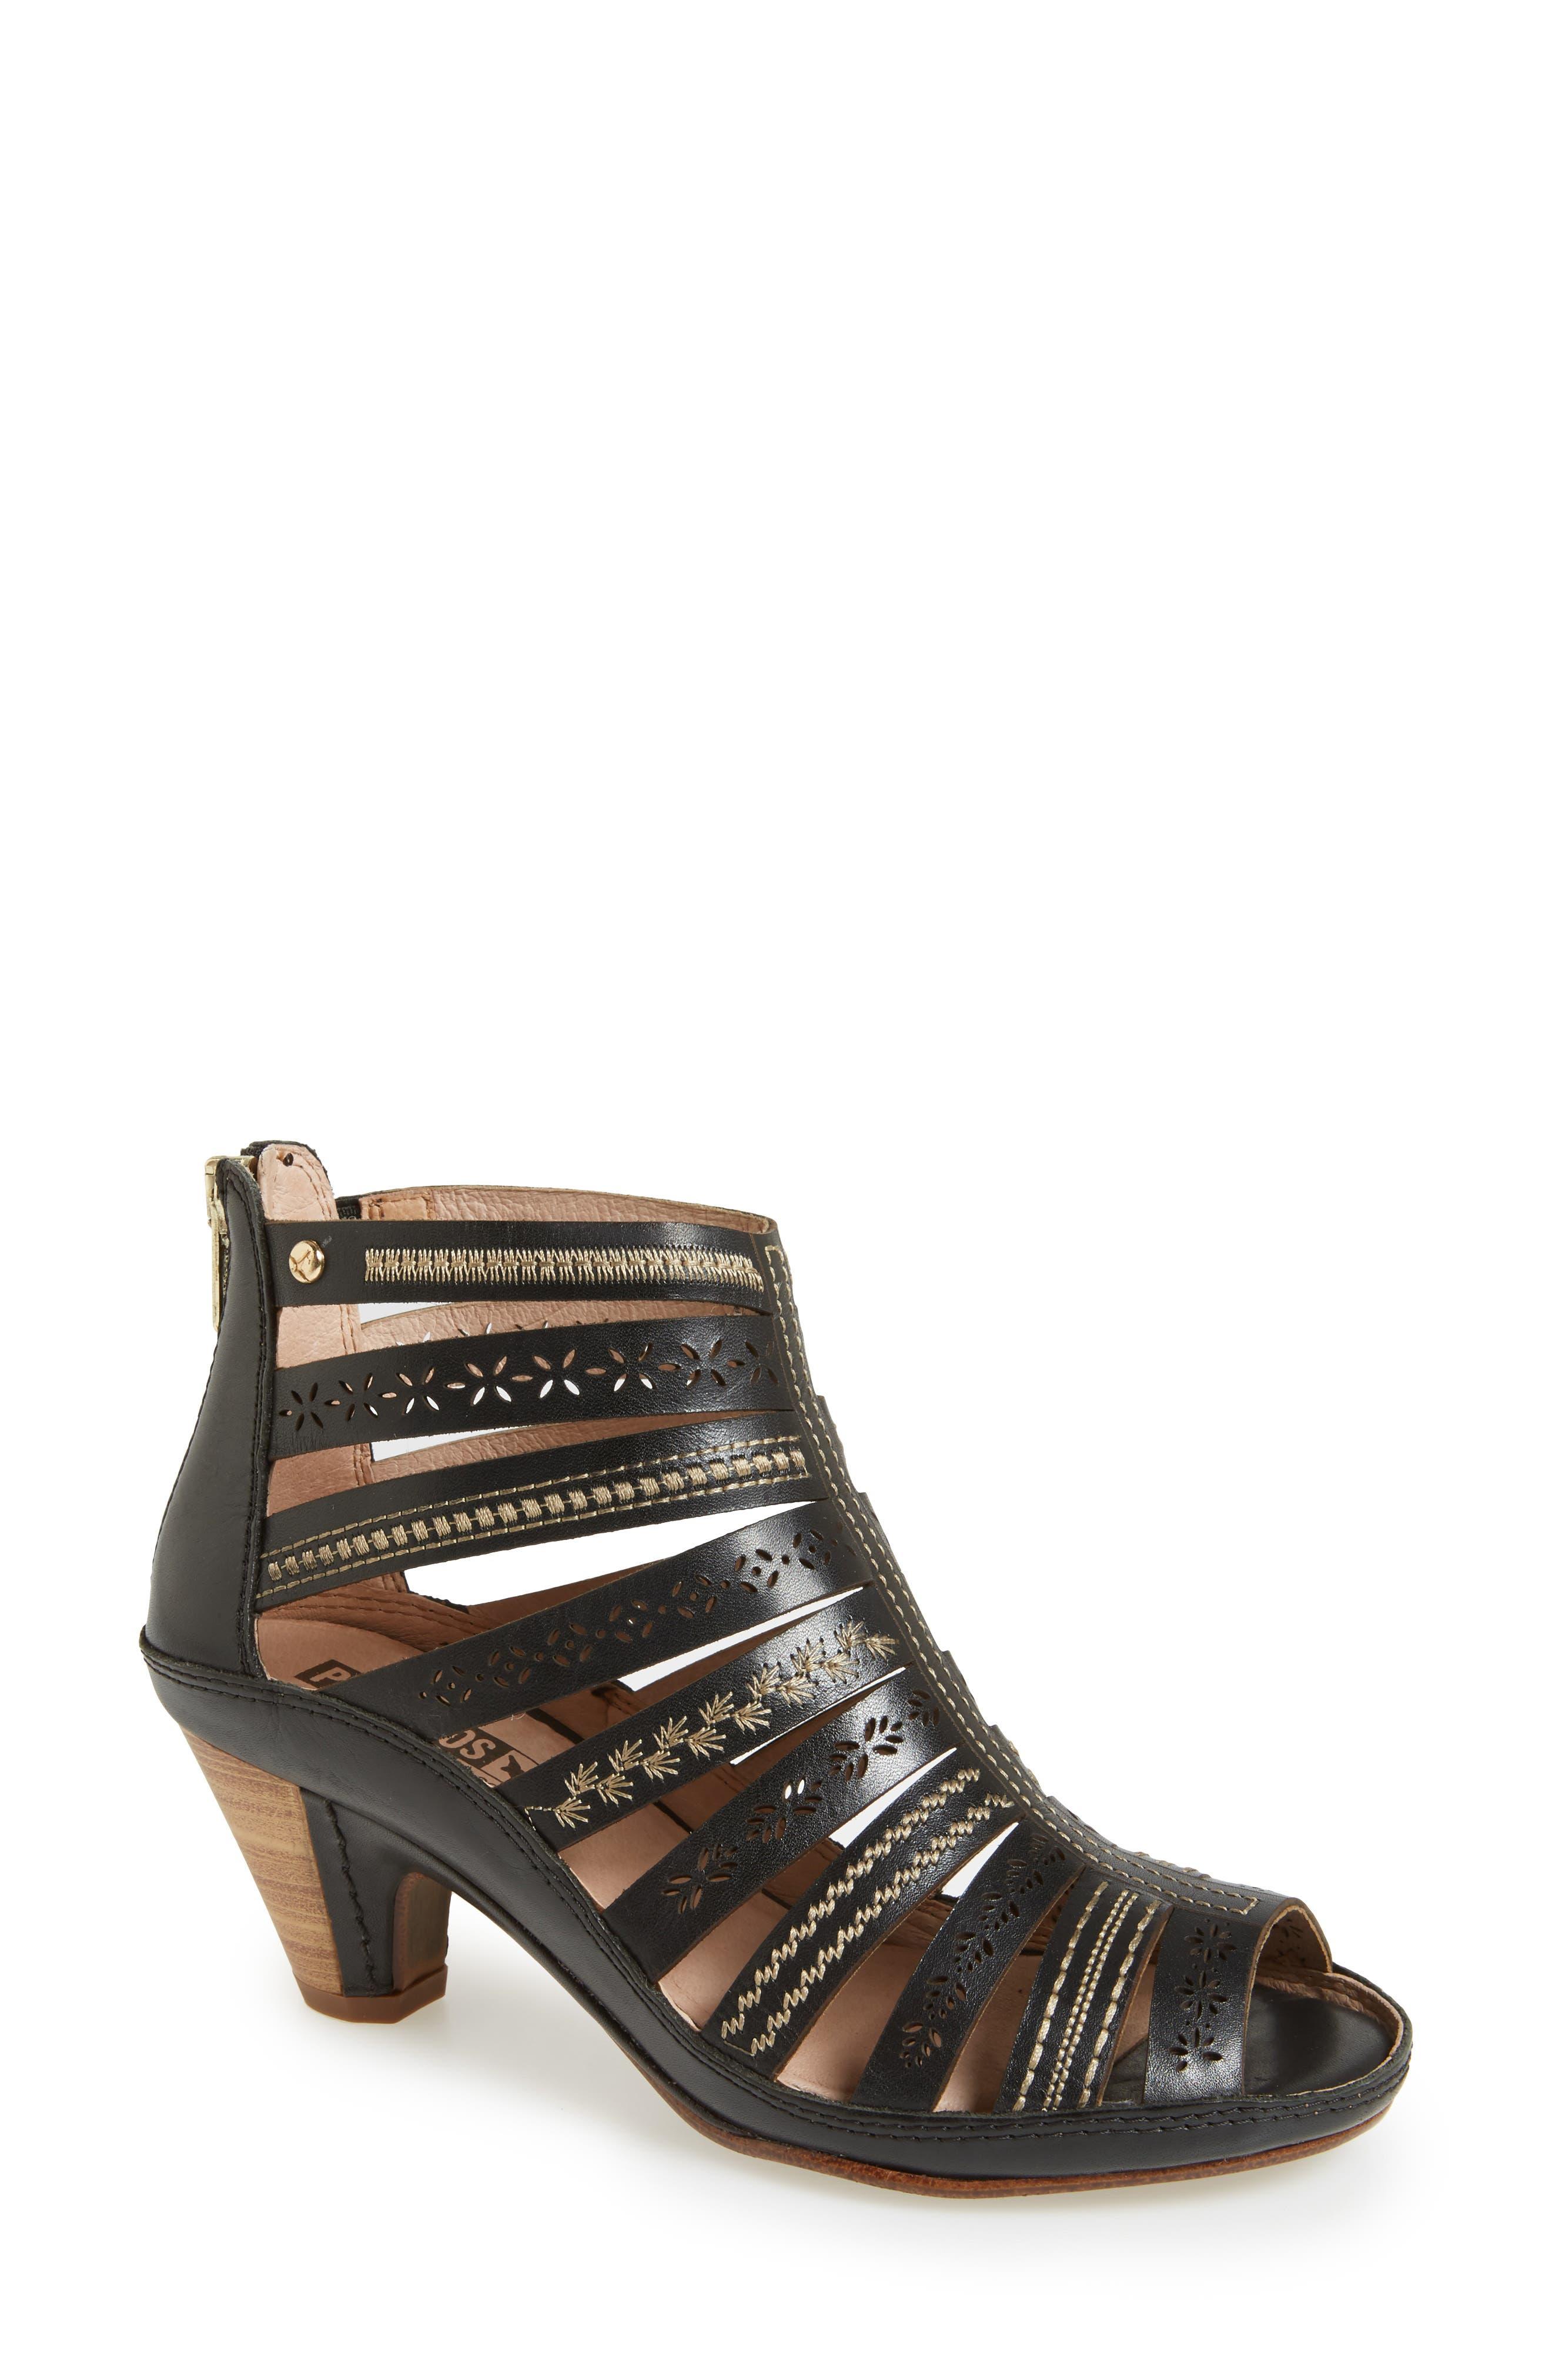 Alternate Image 1 Selected - PIKOLINOS 'Java' Leather Gladiator Sandal (Women)